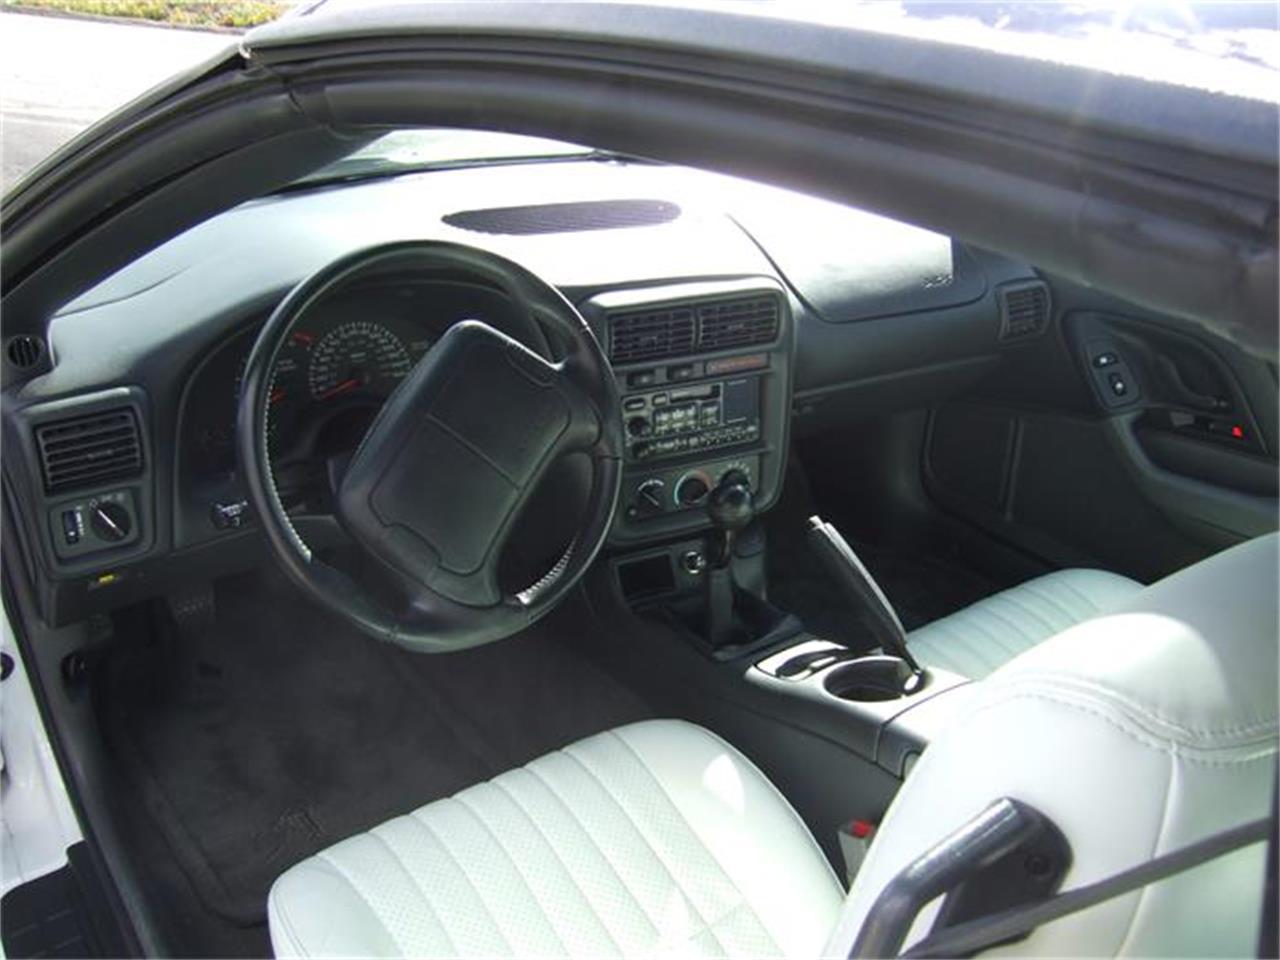 Large Picture of 1997 Chevrolet Camaro Z28 located in California - $16,000.00 - B1LI